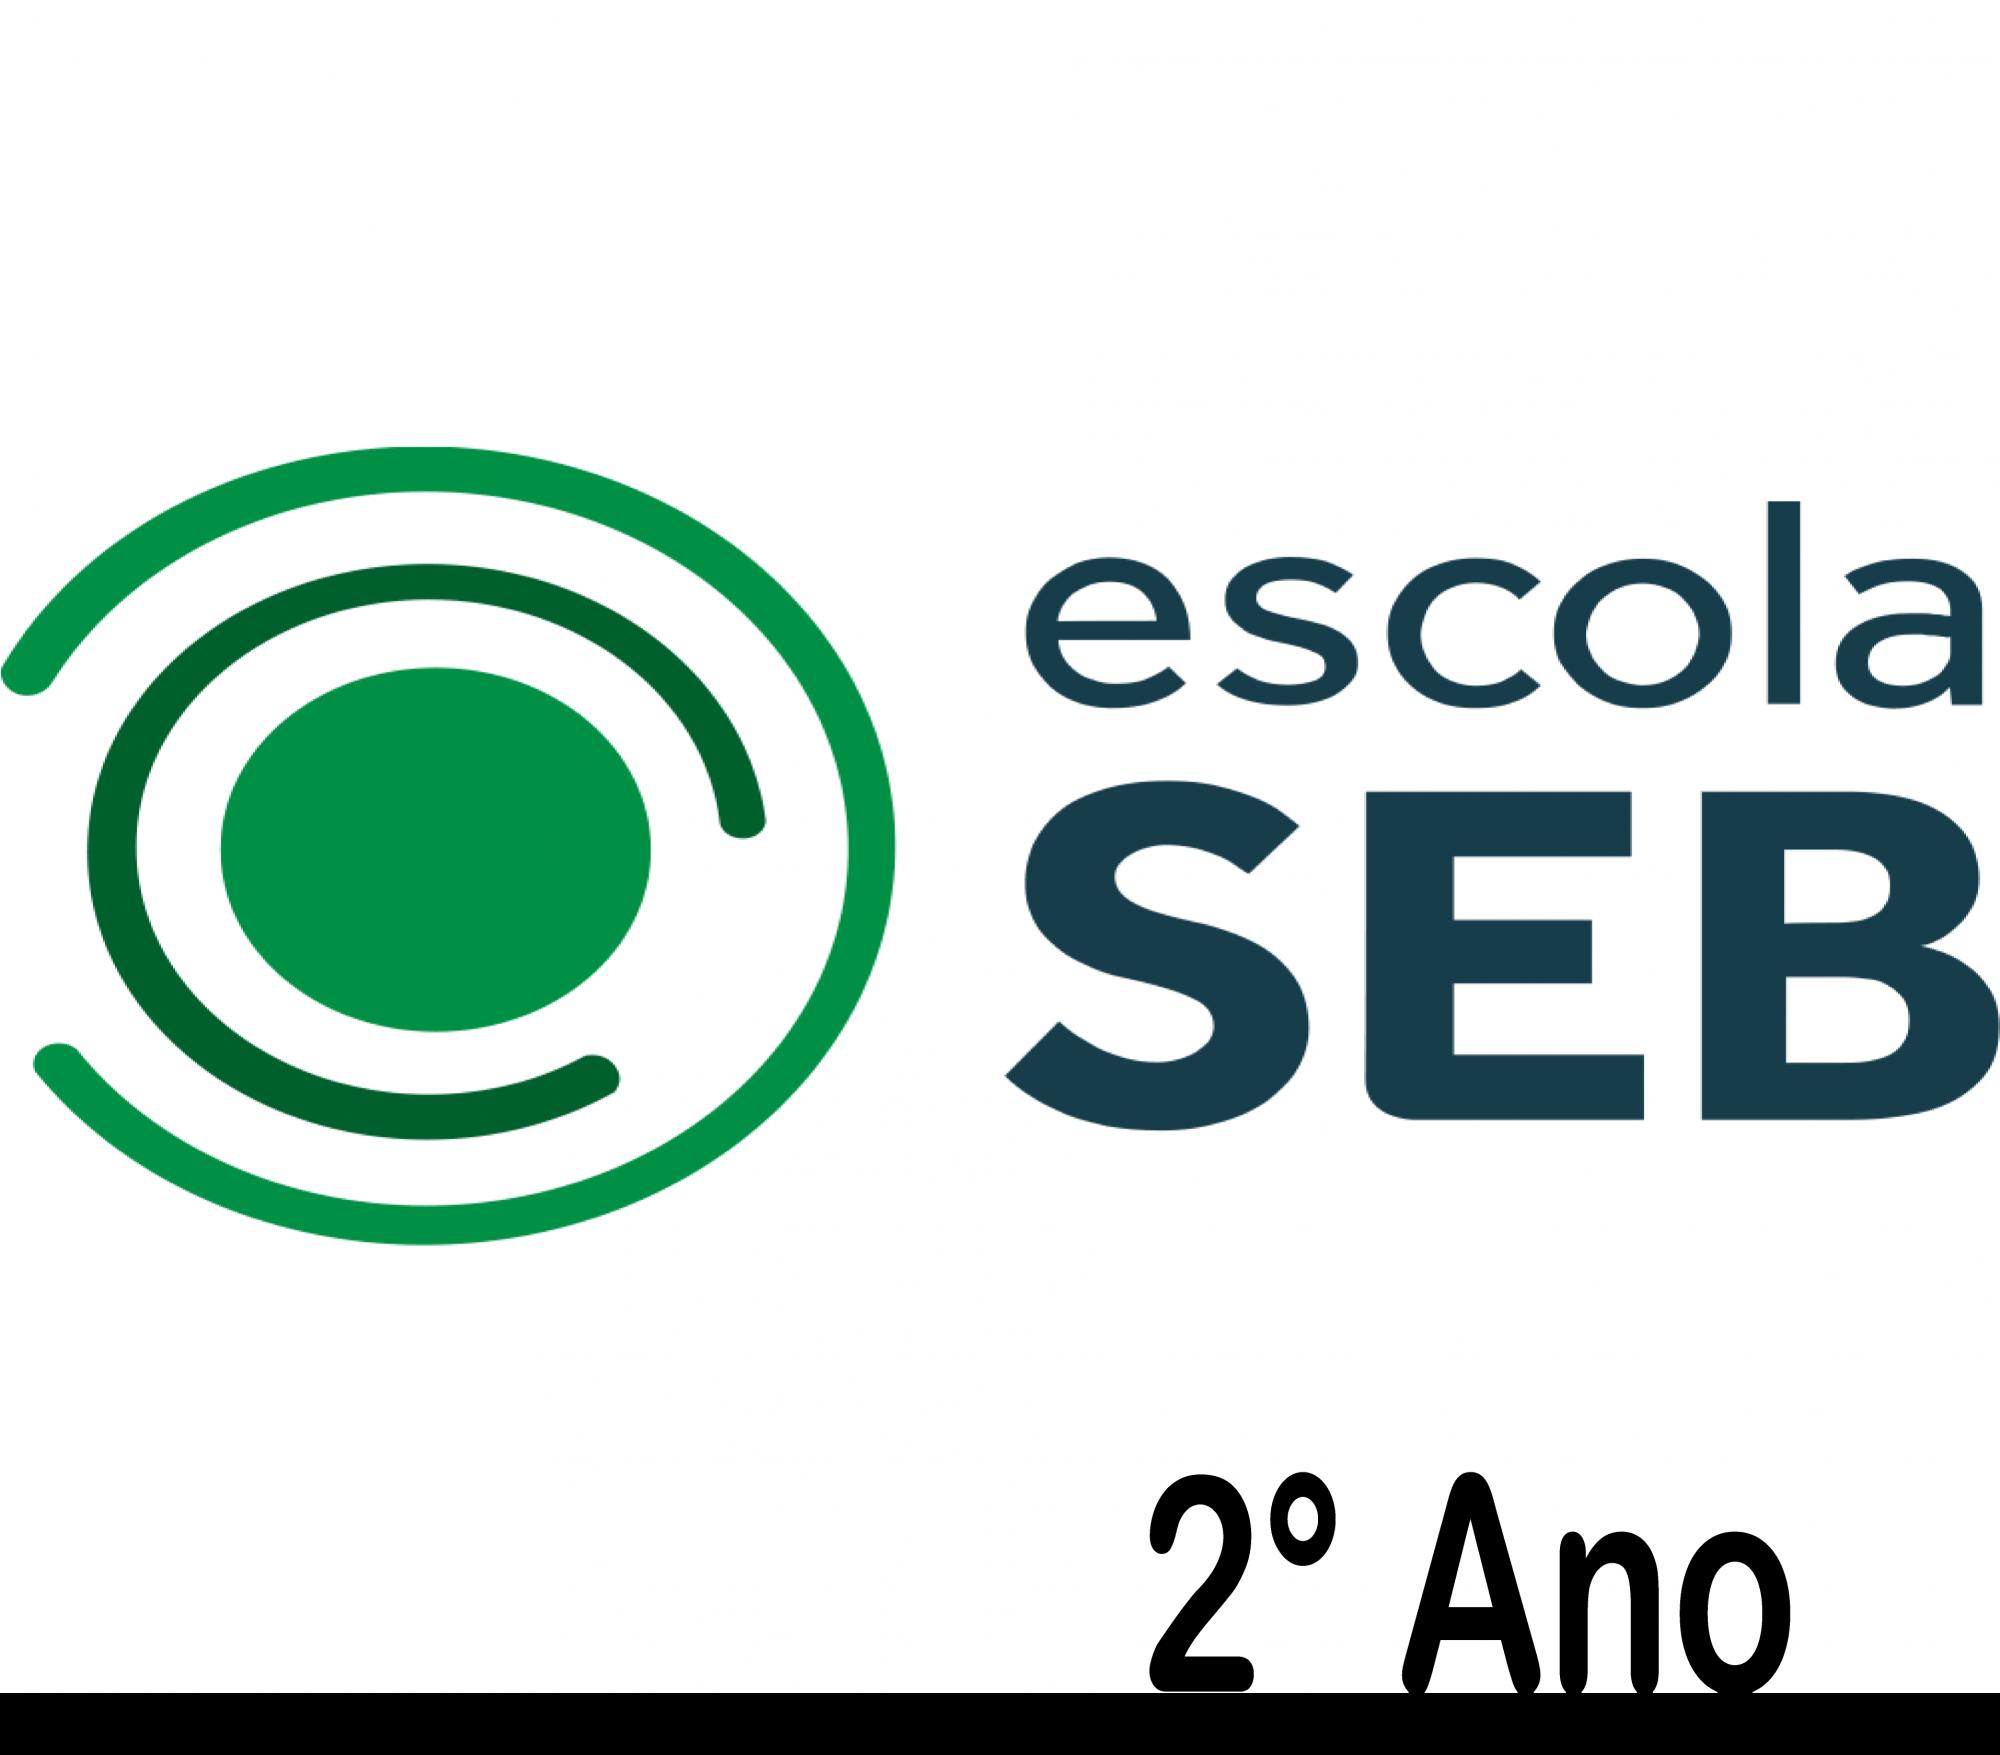 Seb Coc - 2° Ano uso pessoal Faber-Castell  - 2021